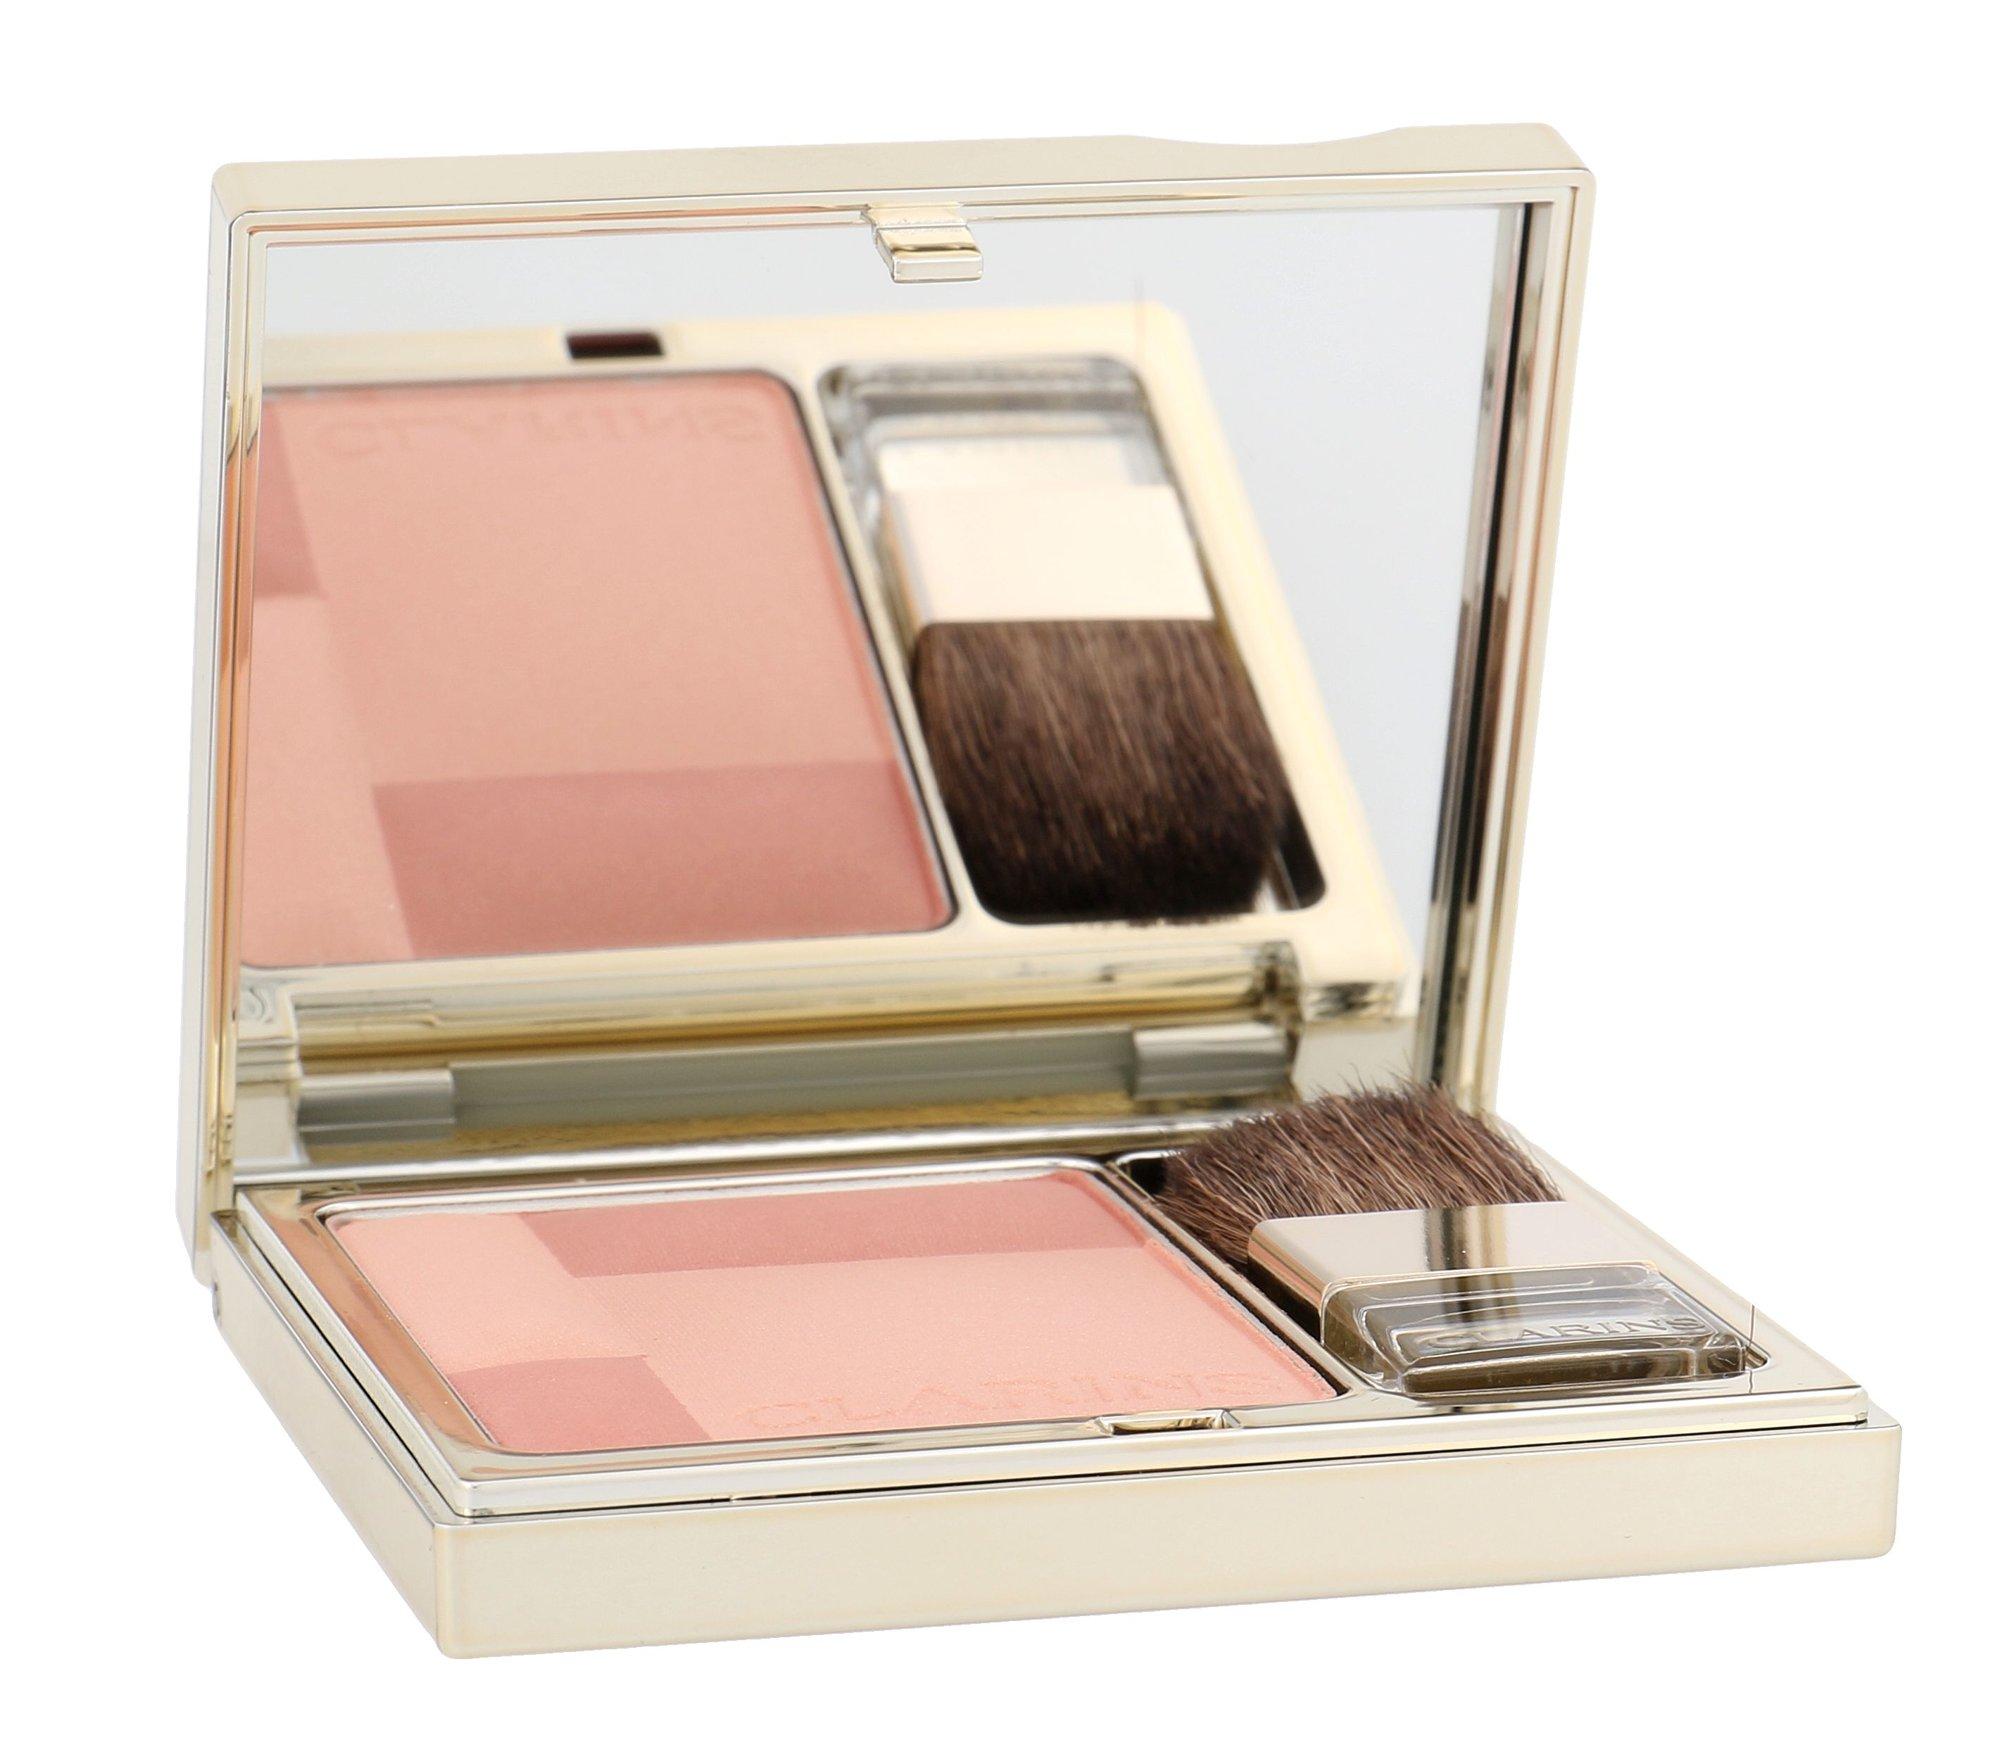 Clarins Blush Prodige Cosmetic 7,5ml 02 soft peach